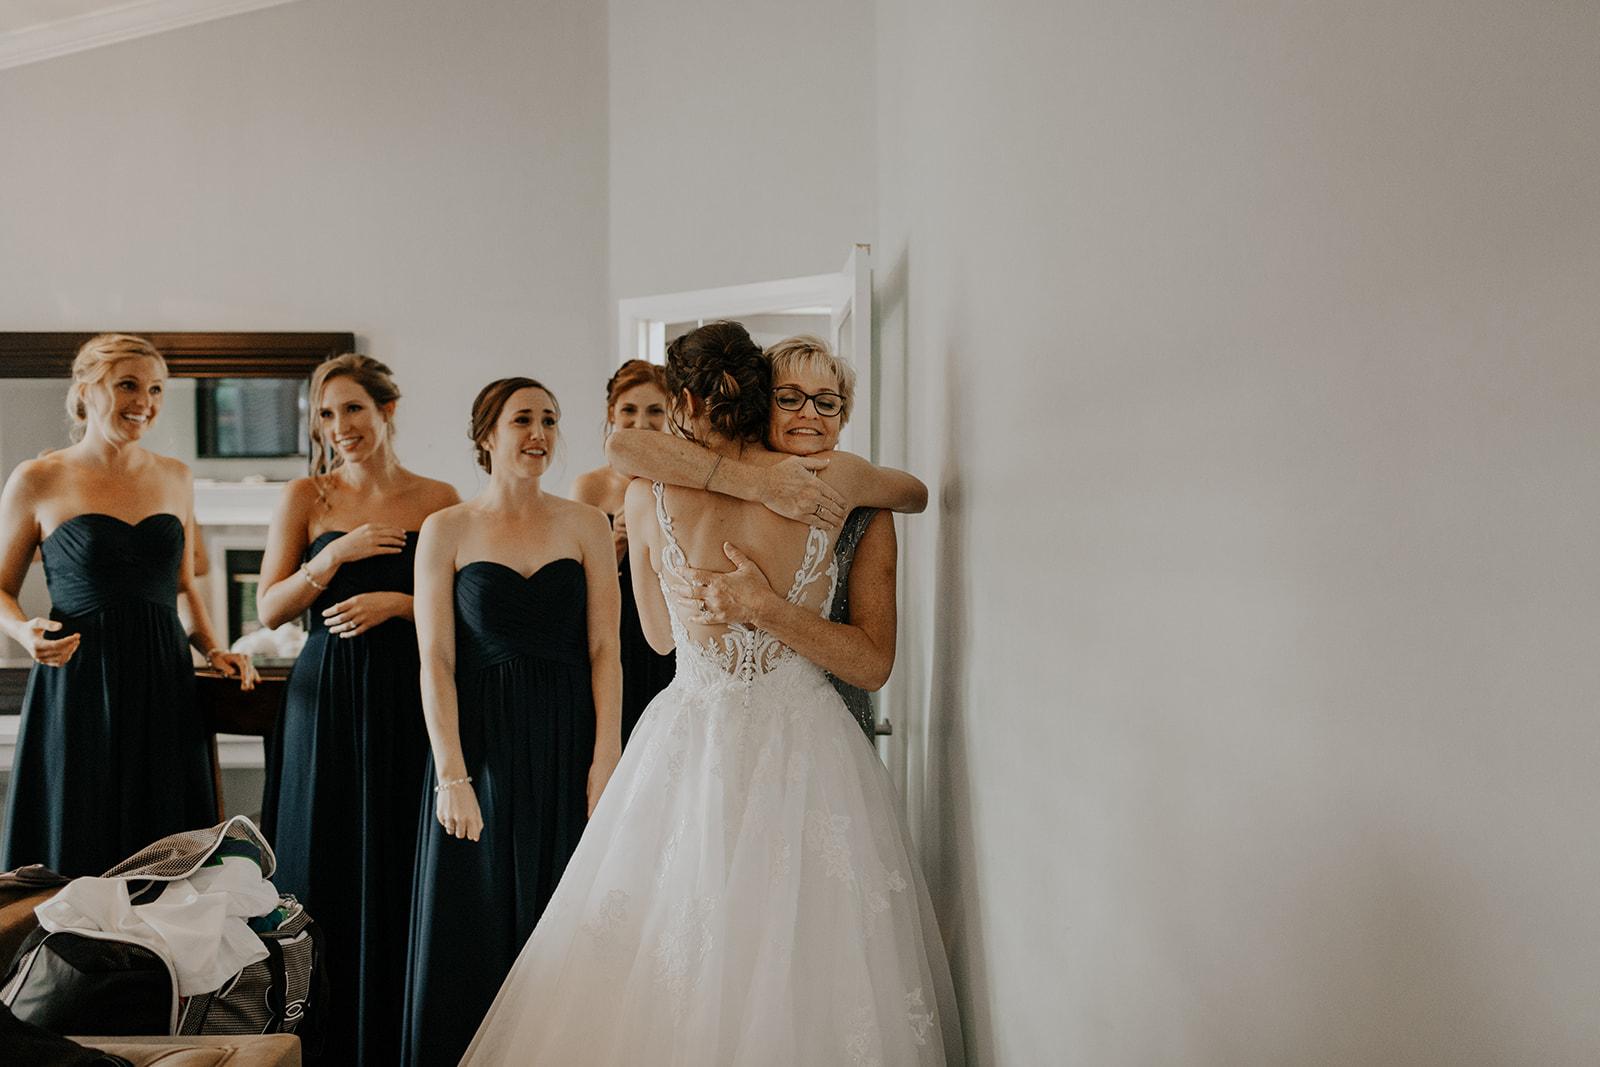 ginapaulson_camiryan_wedding-236.jpg